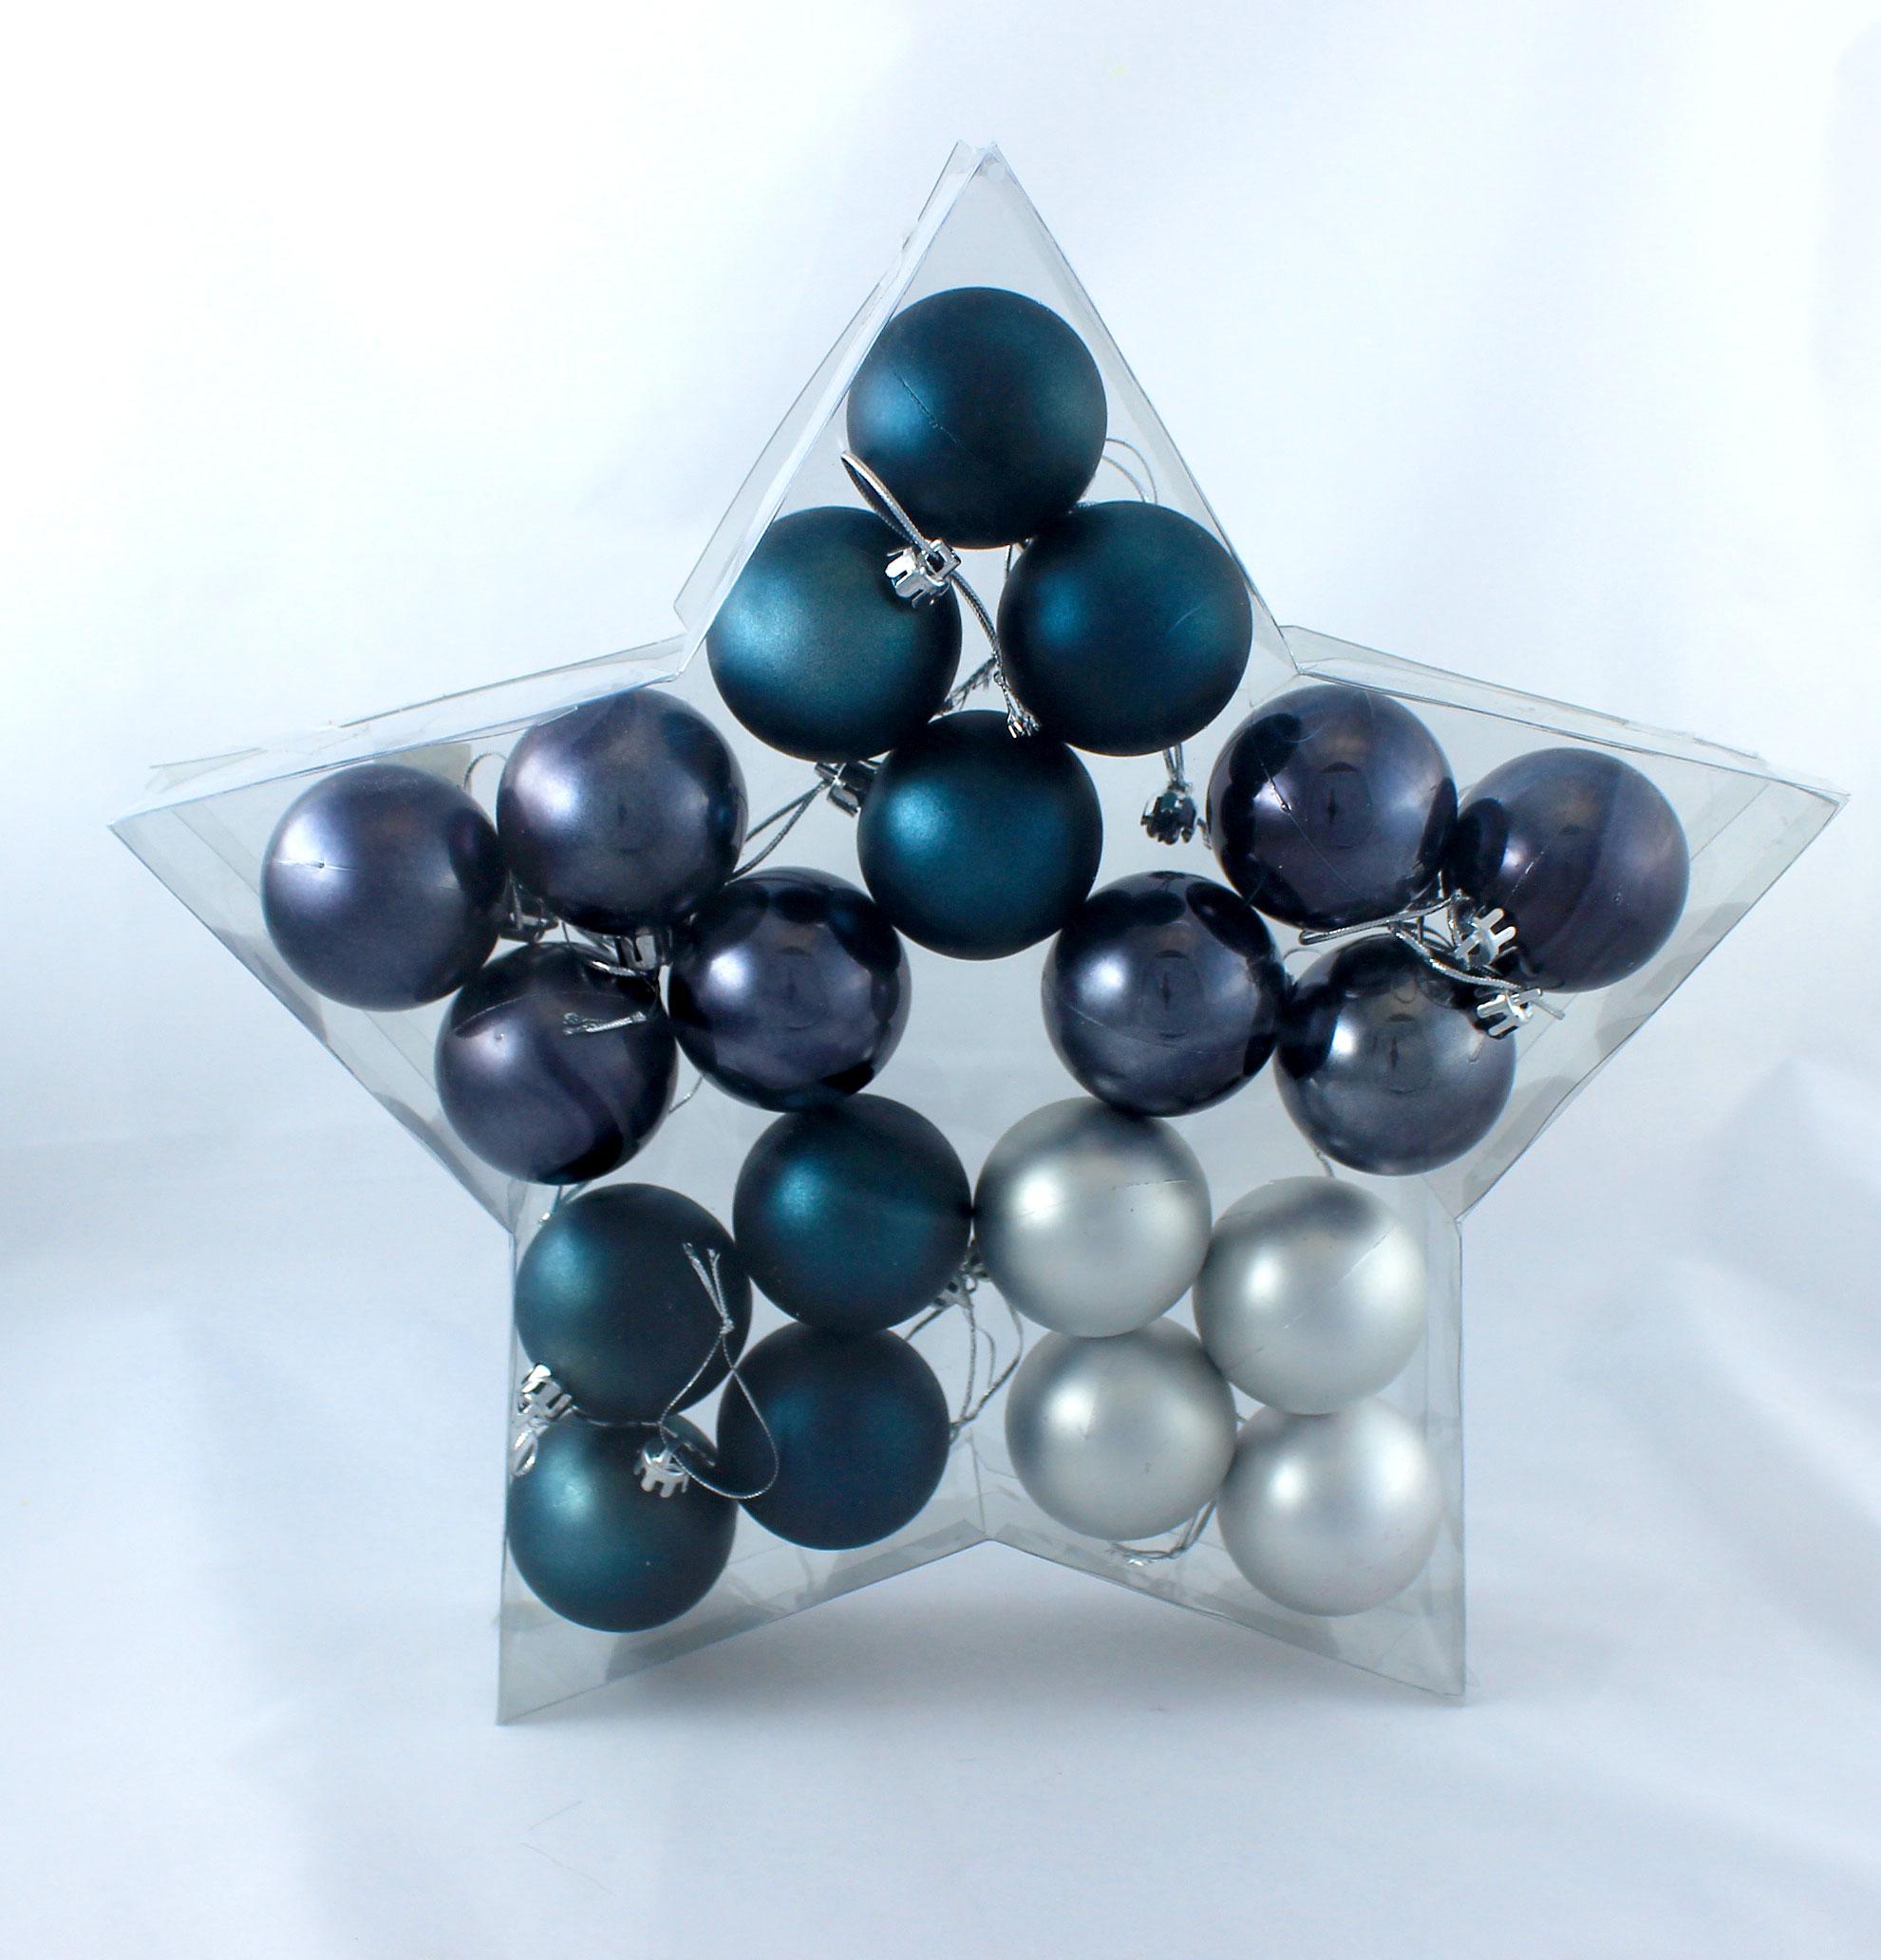 weihnachtskugel plastik 5cm stahlblau 20st preiswert online kaufen. Black Bedroom Furniture Sets. Home Design Ideas